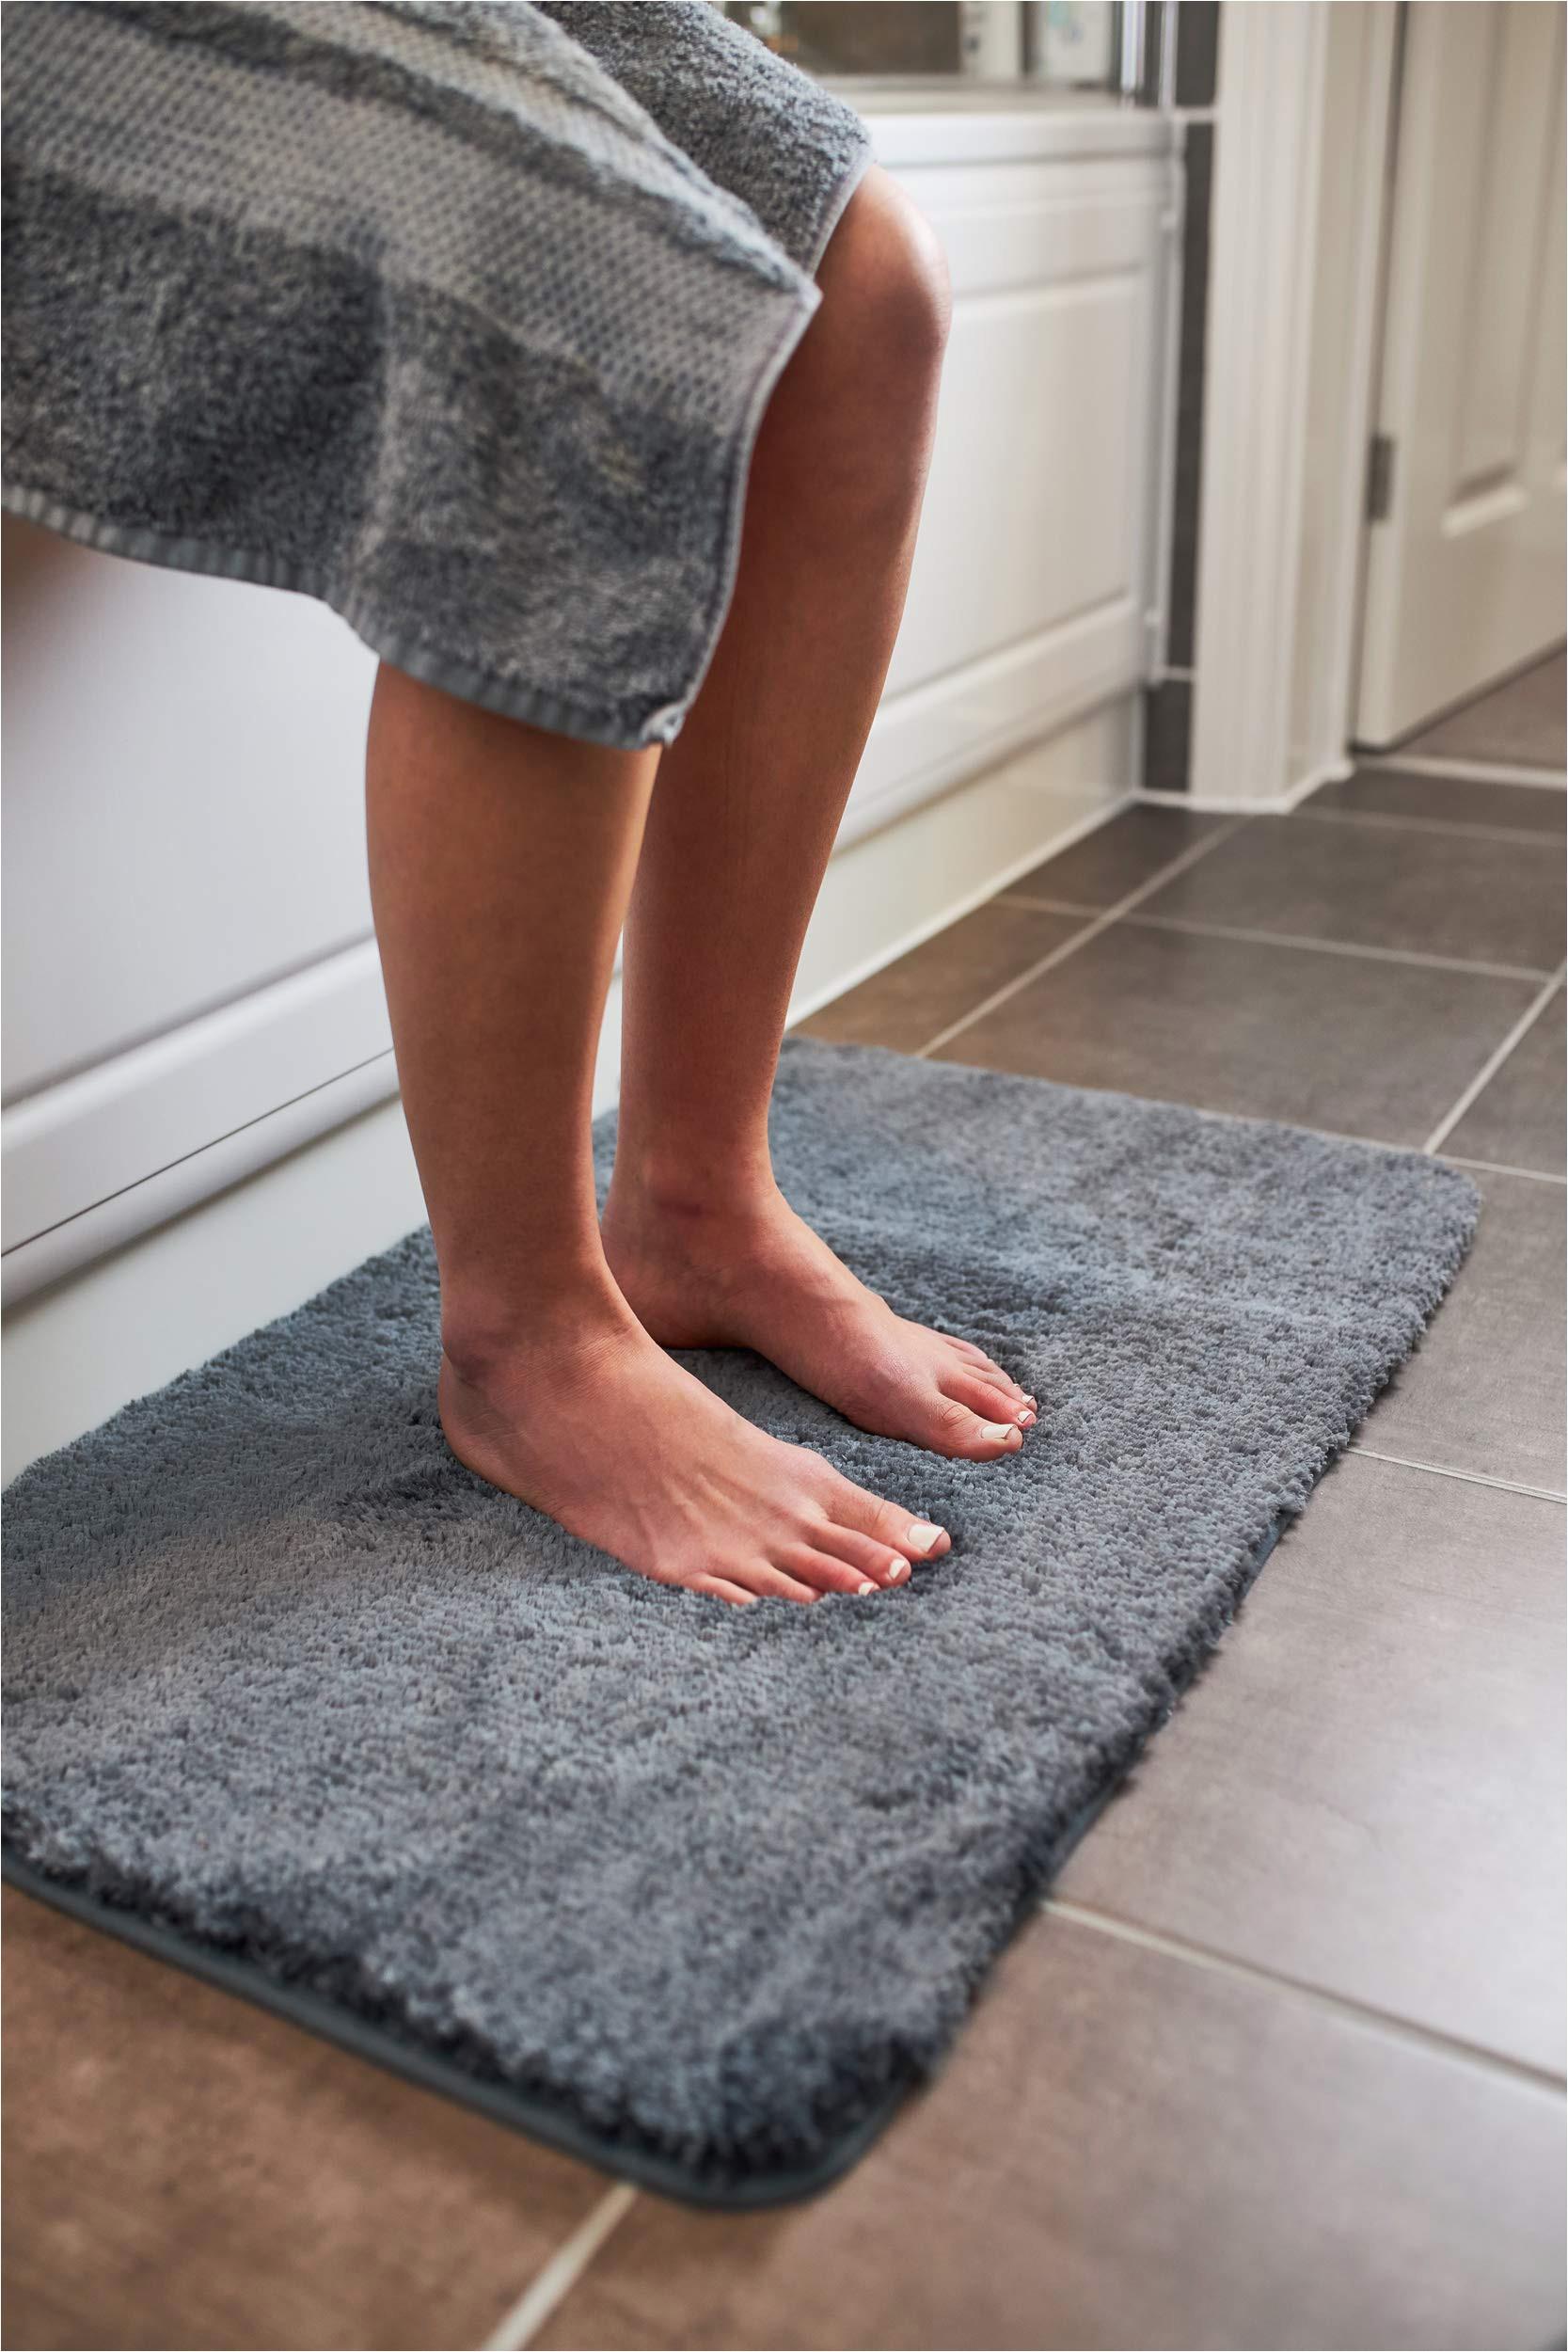 Premium Bath Microfiber Chenille Bath Rug Luxury Grey Bath Mat Microfiber Non Slip Bath Rug with Super soft Absorbent Dry Fast Design for Bath and Shower